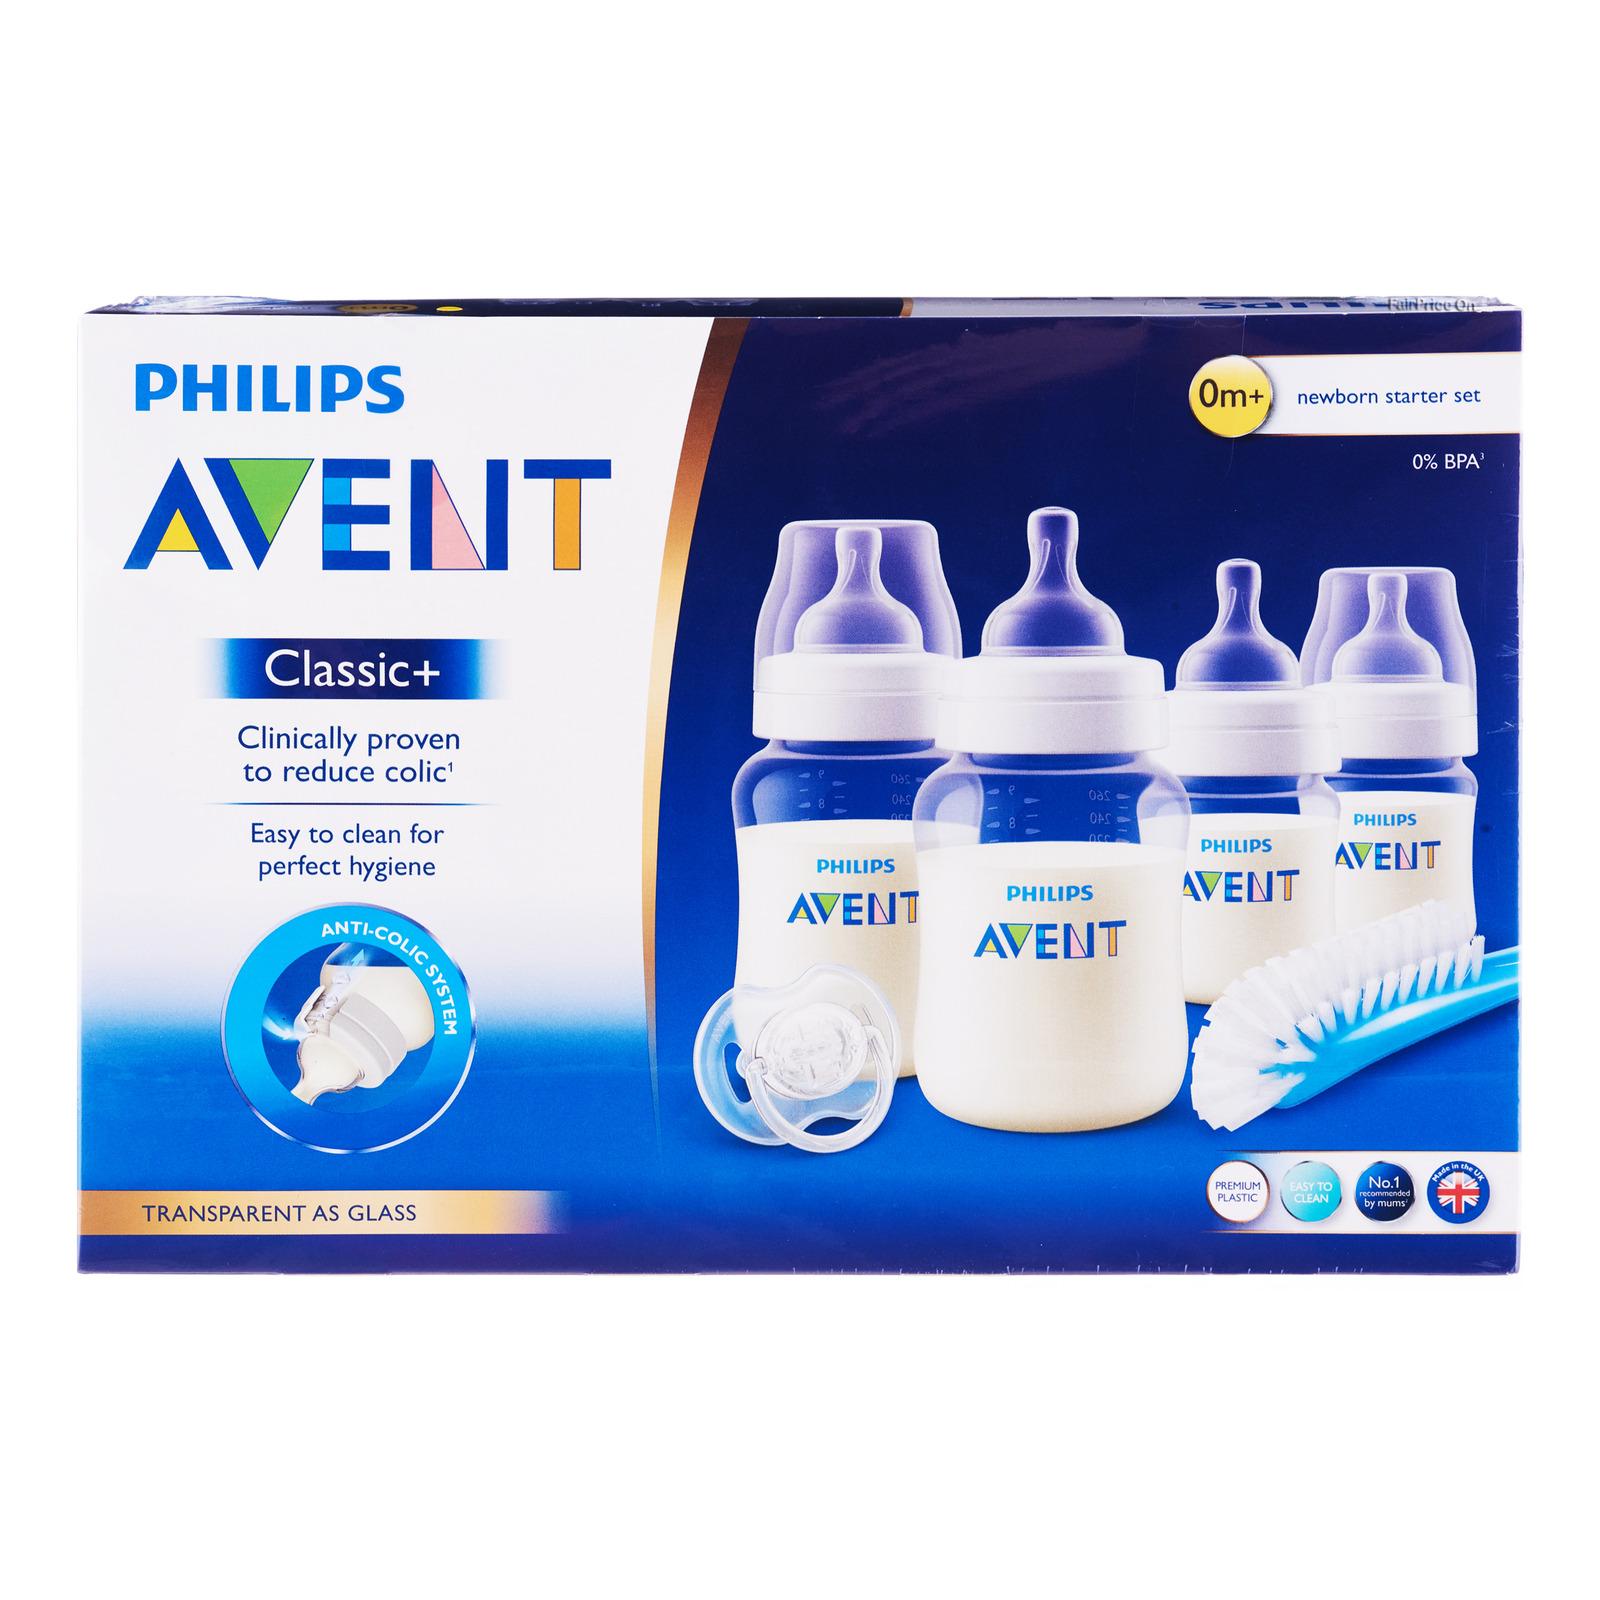 Philips Avent Newborn Starter Set - Classic+ PA